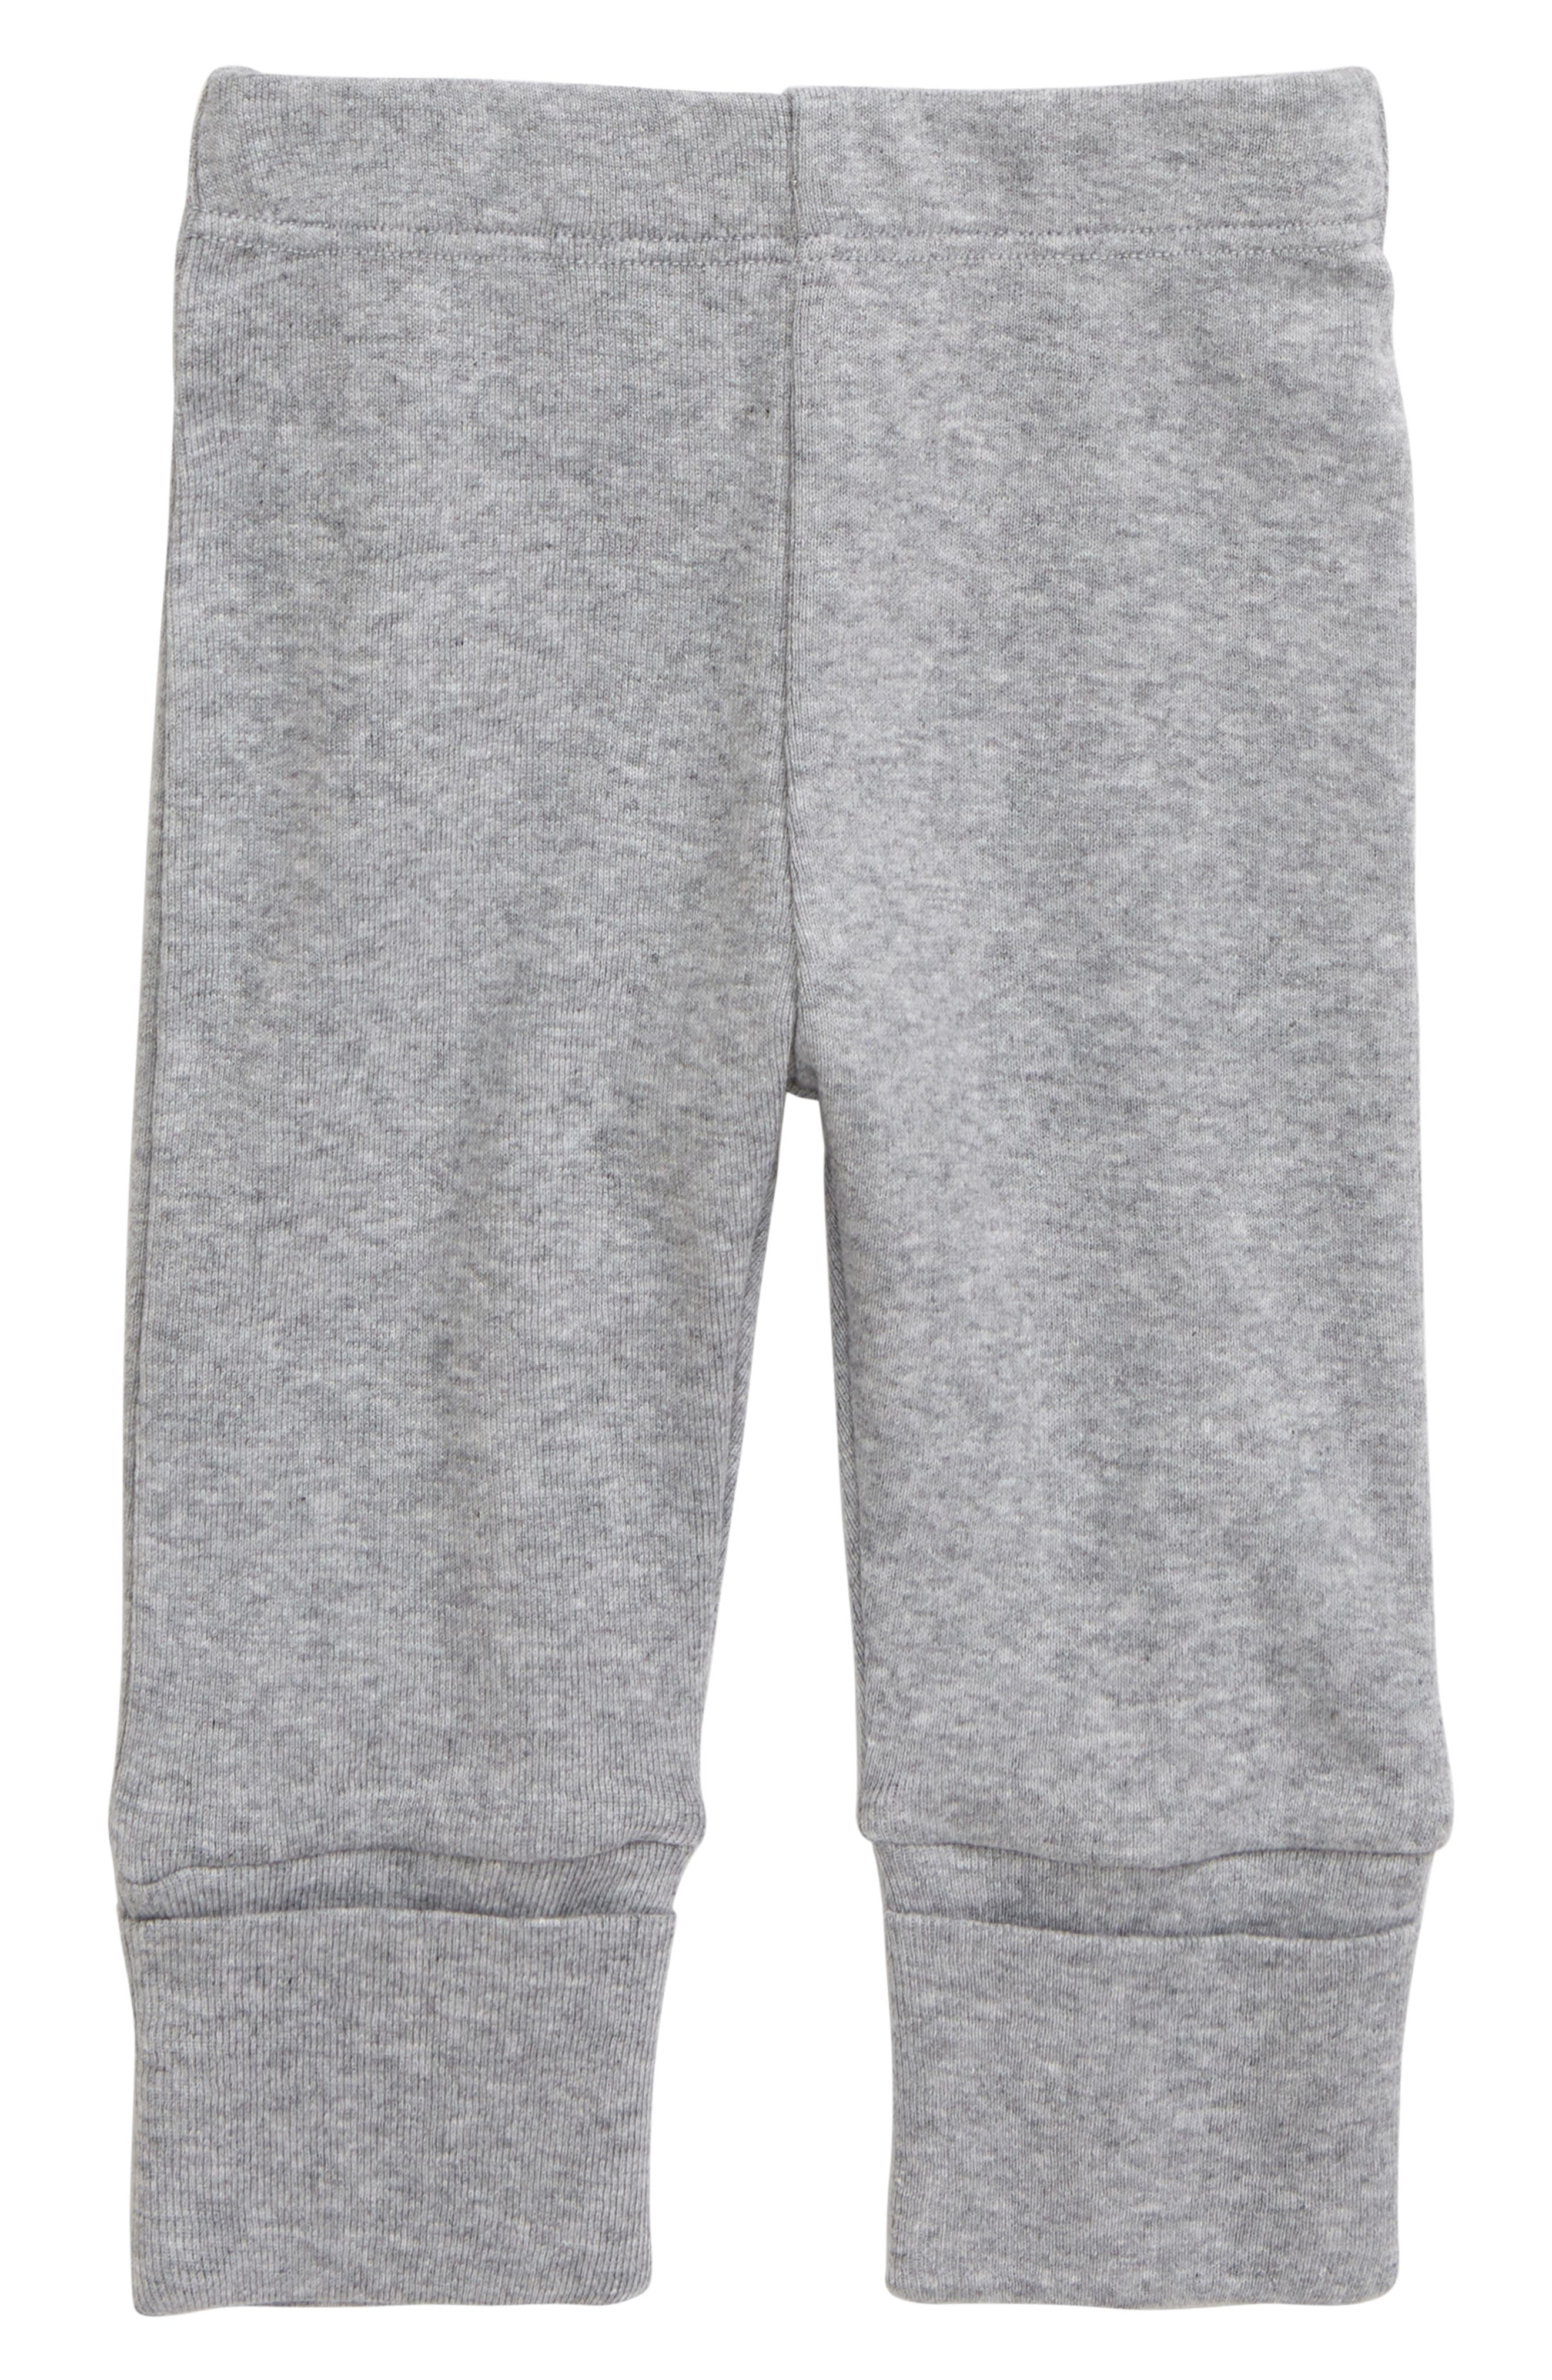 Infant Boys Monica  Andy Hello Baby Organic Cotton Pants Size Newborn  Grey